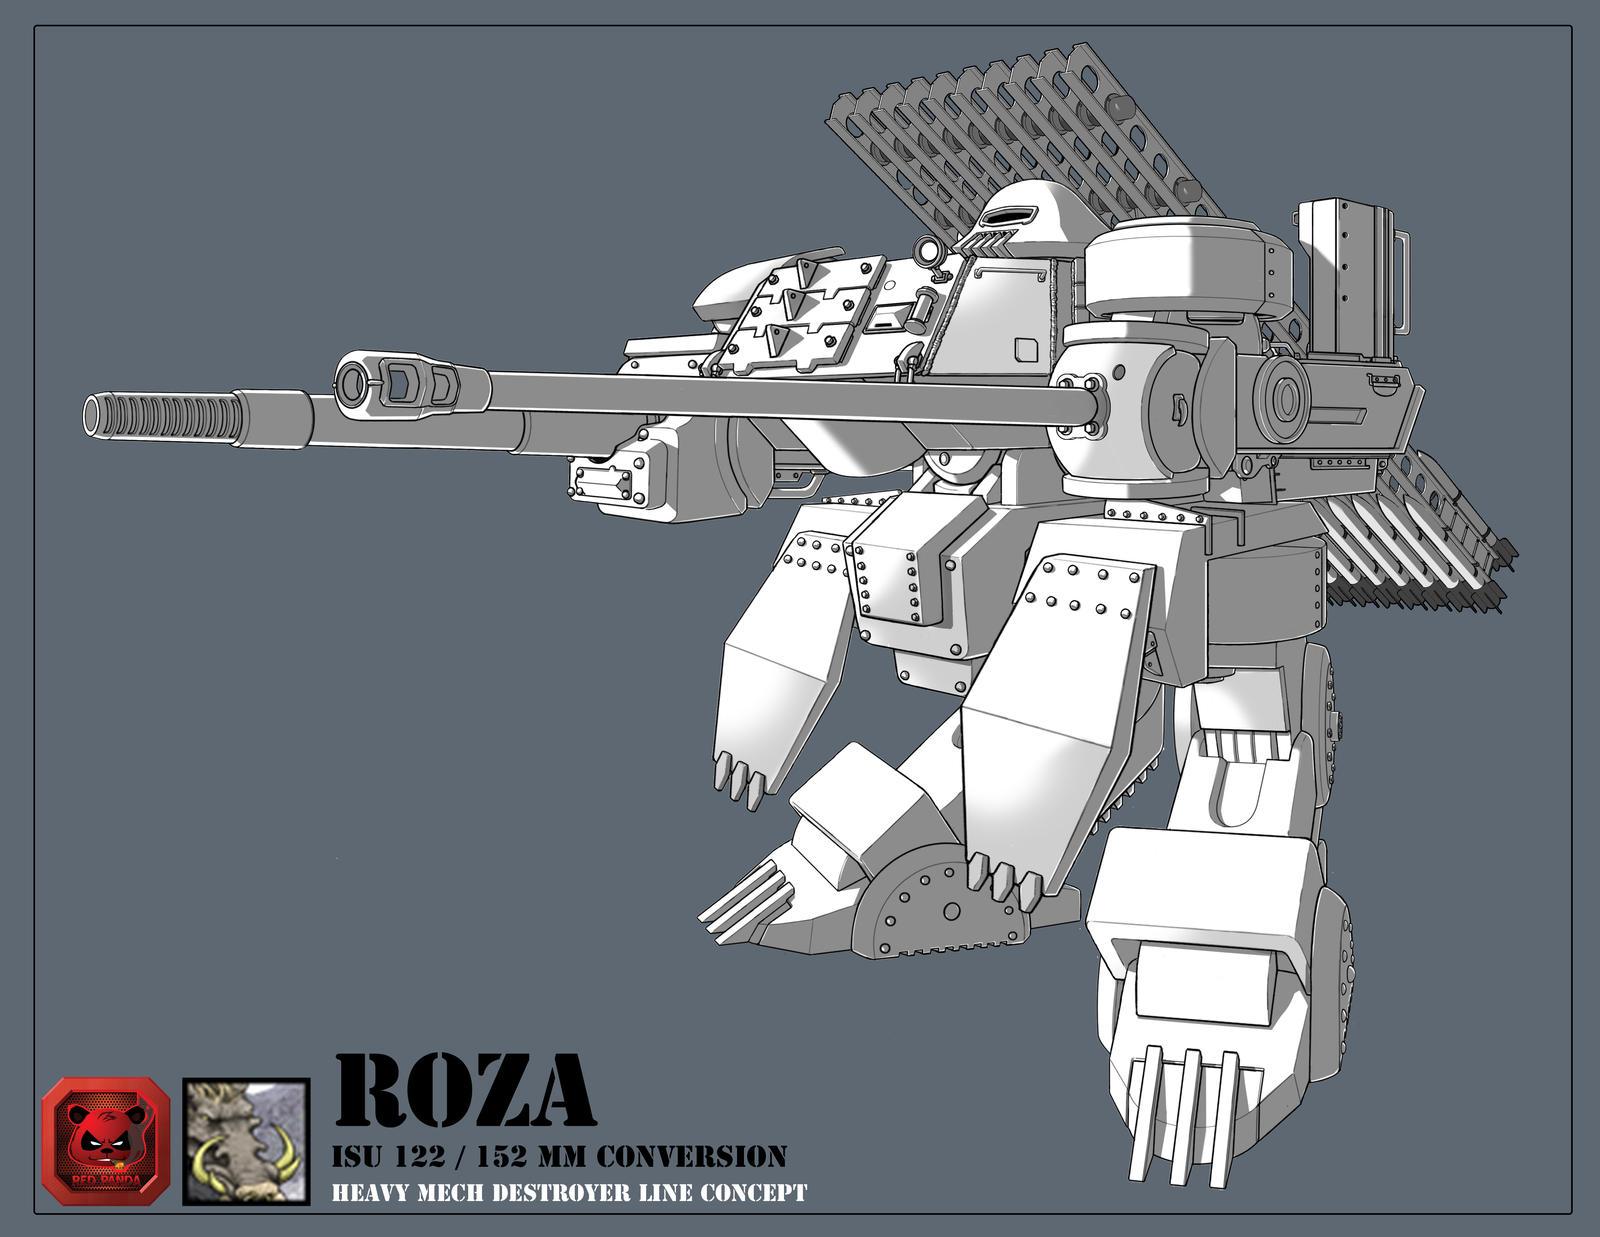 Roza Revised